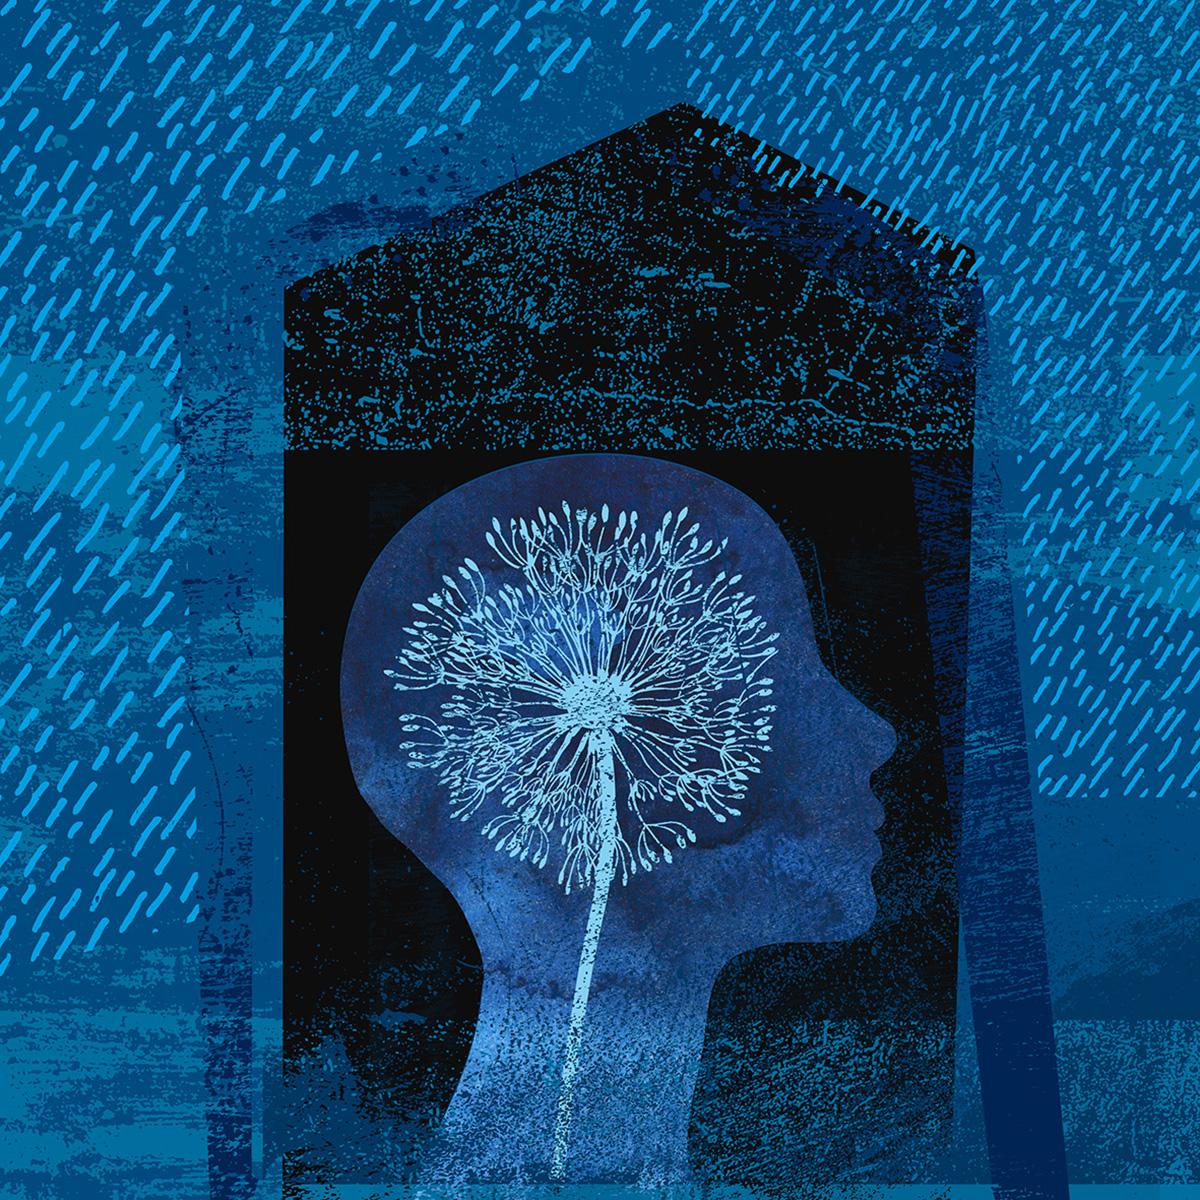 Karin Kemi Mixed media |Giclée Fine art print, collage 30 x 30 cm 3 700 kr svenskakonstnarer.se